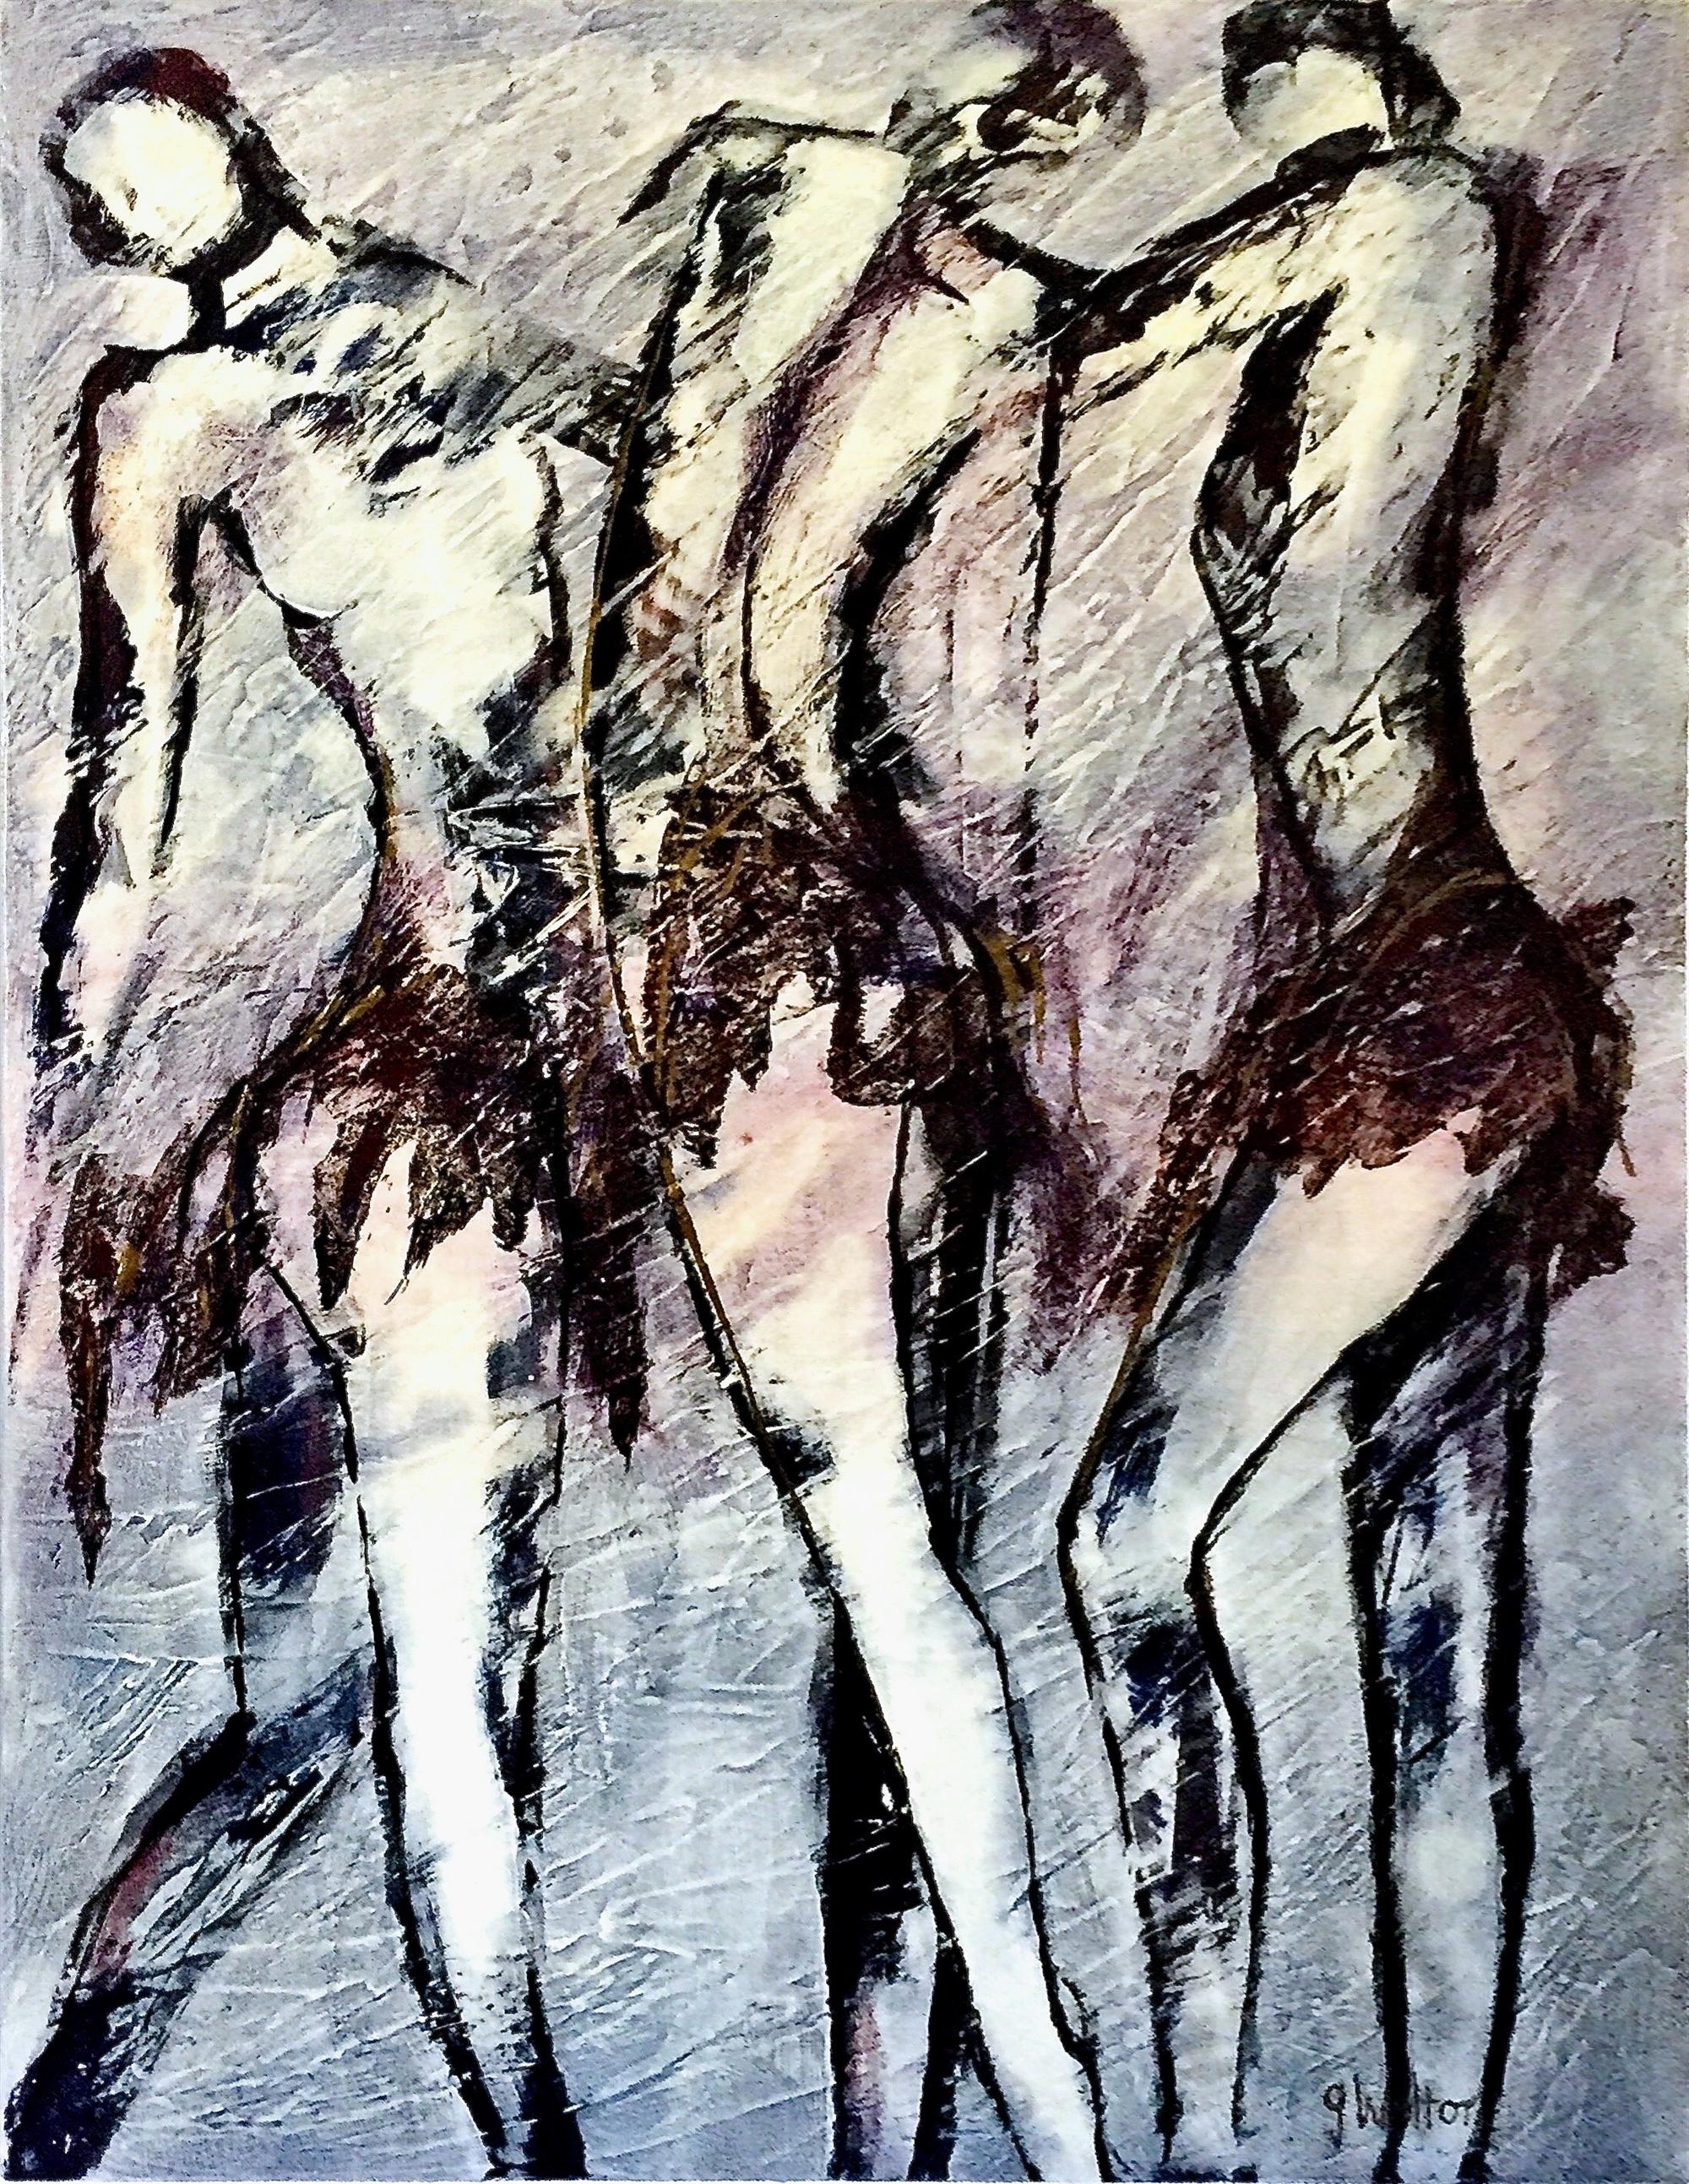 Reverie by Gary Welton